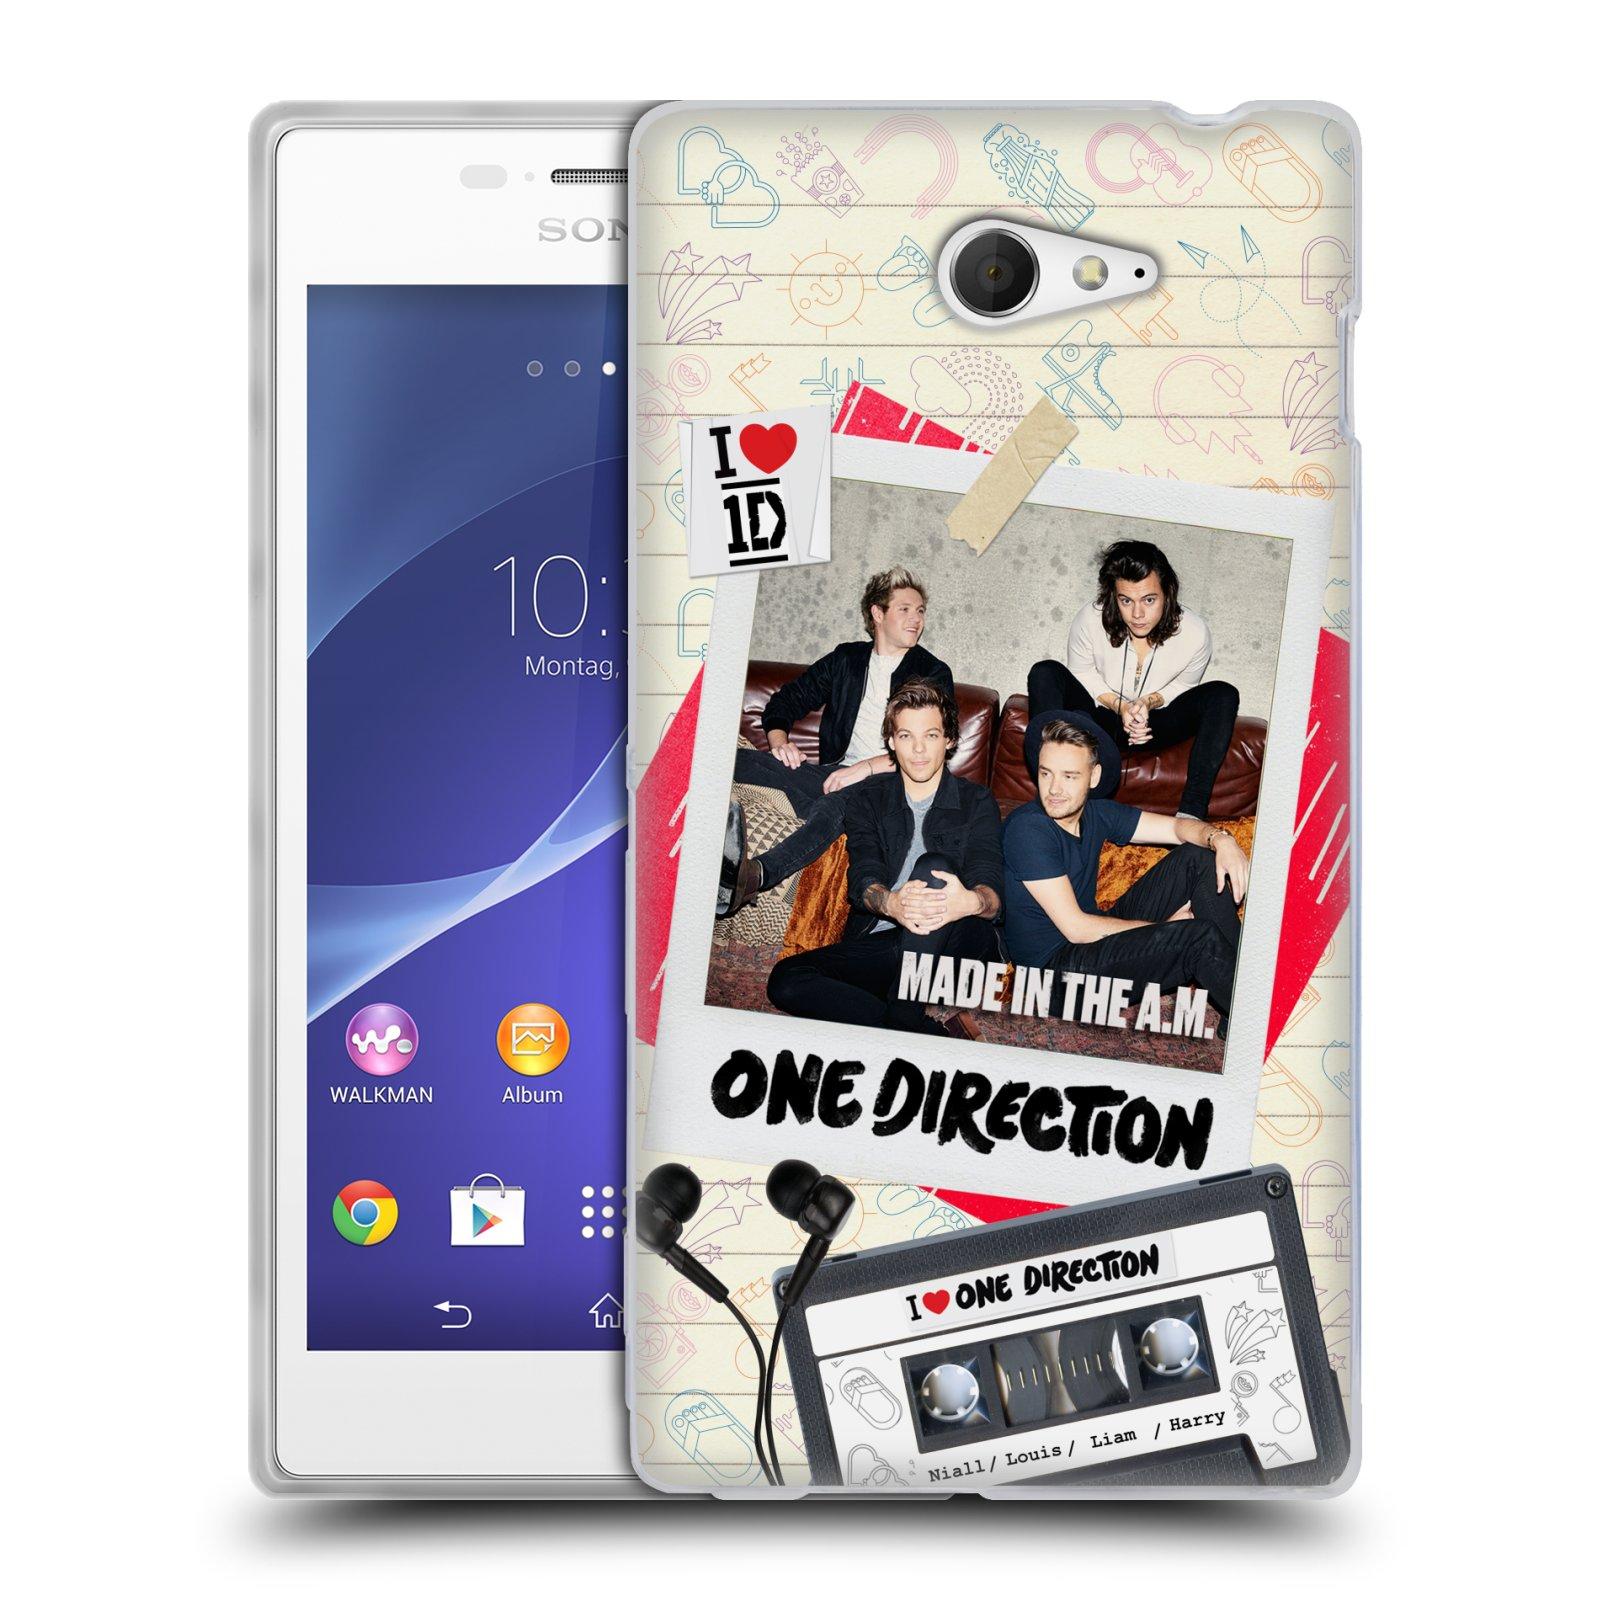 Silikonové pouzdro na mobil Sony Xperia M2 D2303 HEAD CASE One Direction - Kazeta (Silikonový kryt či obal One Direction Official na mobilní telefon Sony Xperia M2)